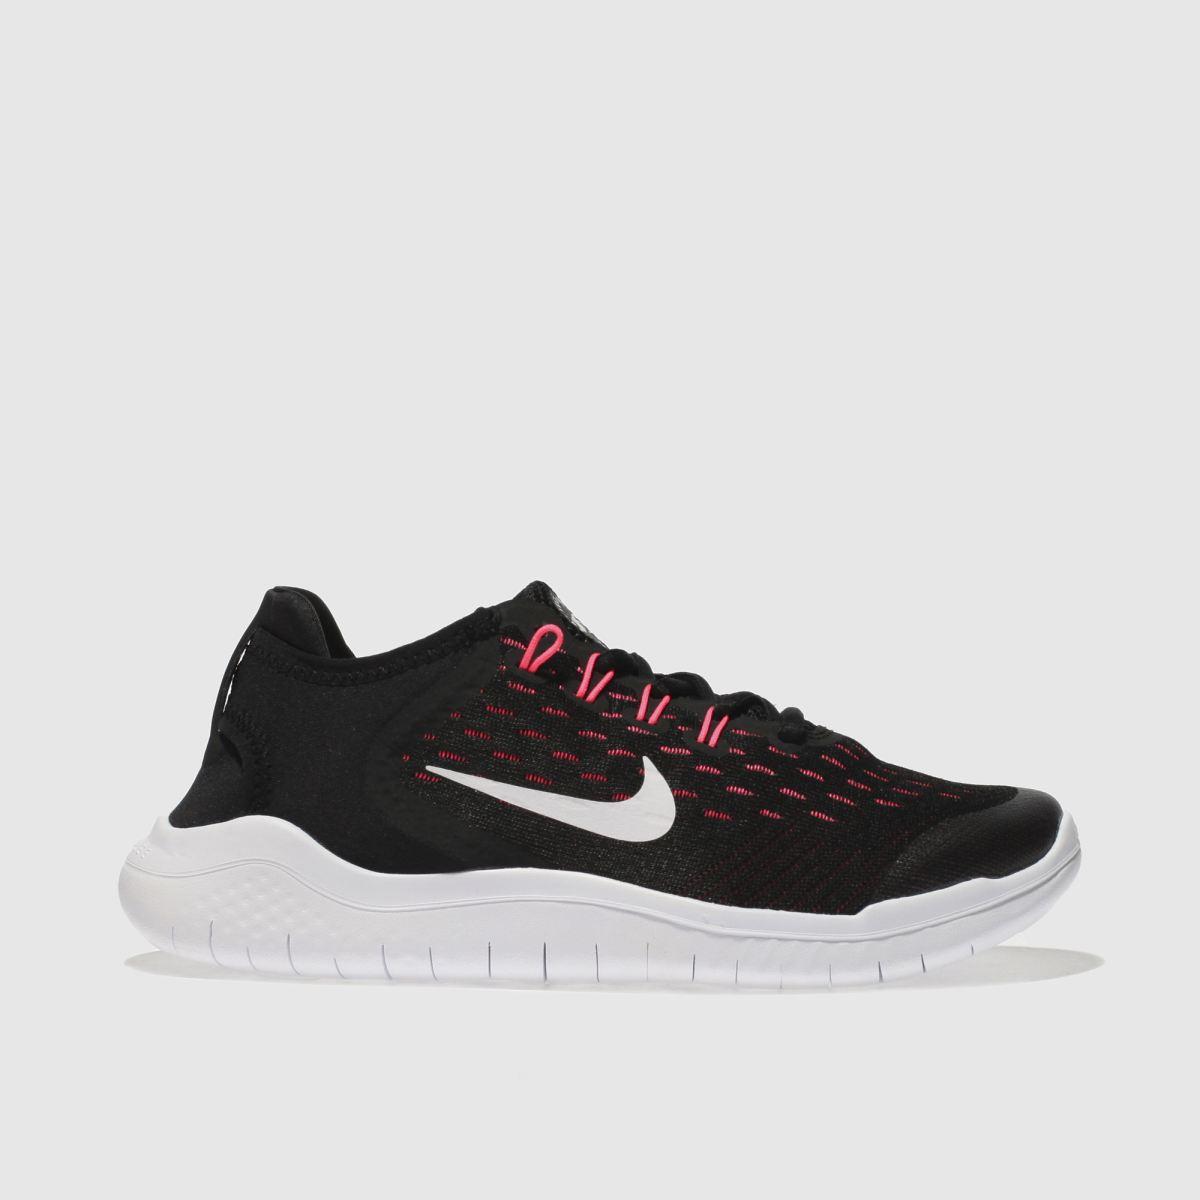 Nike Black & Pink Free Rn 2018 Girls Youth Trainers